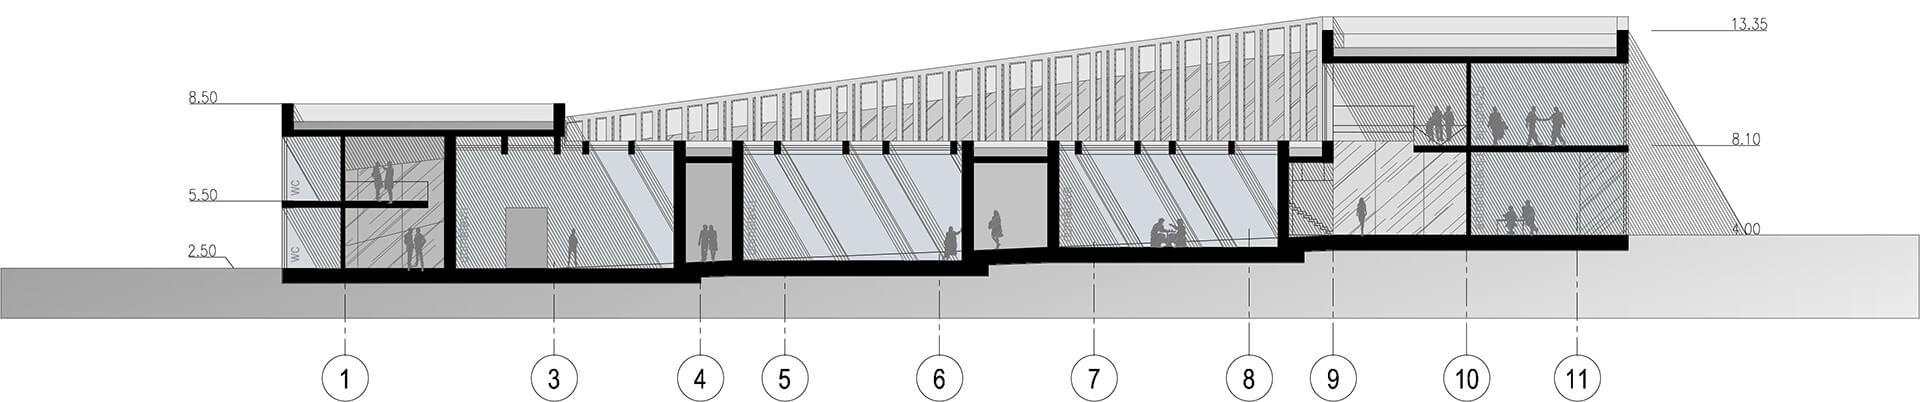 https://laagaarchitects.lv/wp-content/uploads/2019/11/04-01-24-Paliene.jpg